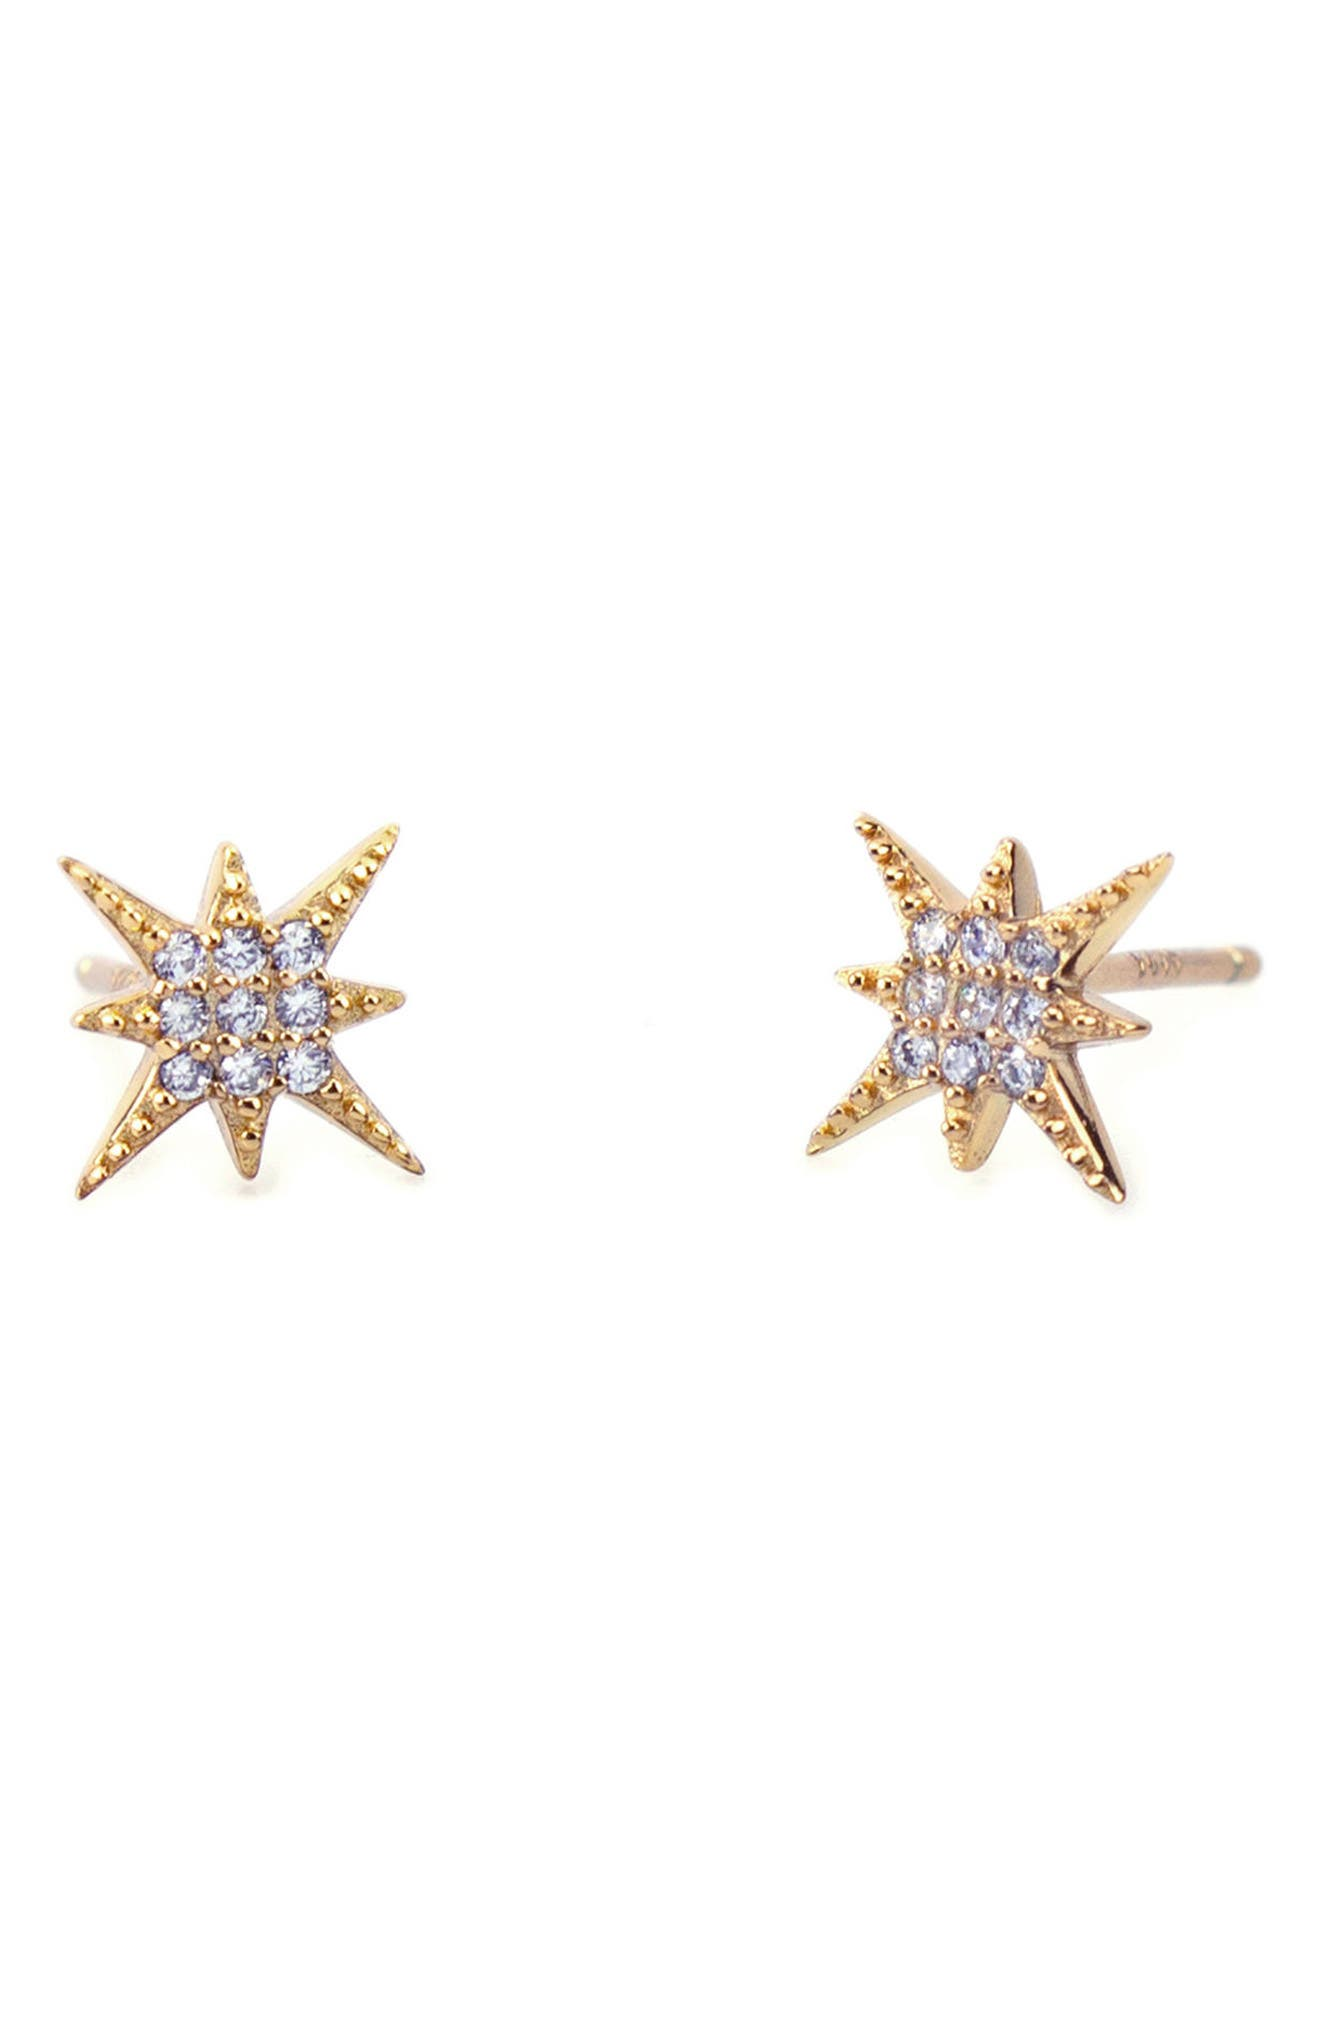 Alternate Image 1 Selected - Kris Nations Pavé Starburst Stud Earrings